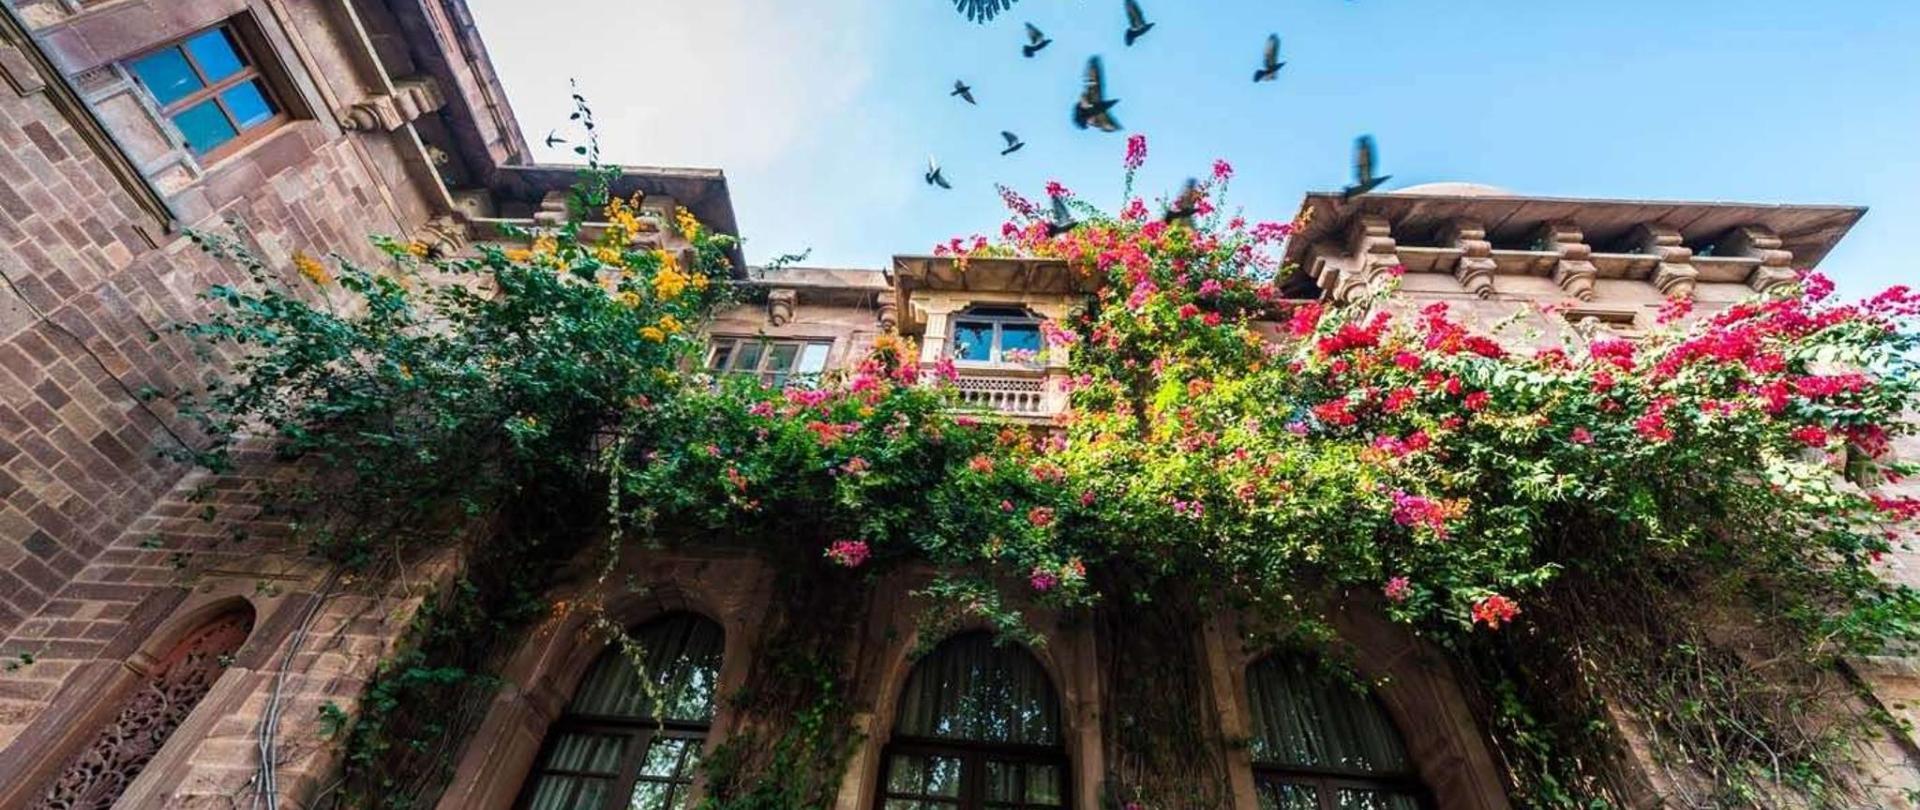 Take vows amidst royal splendor let hearts unite-Ranbanka Palace